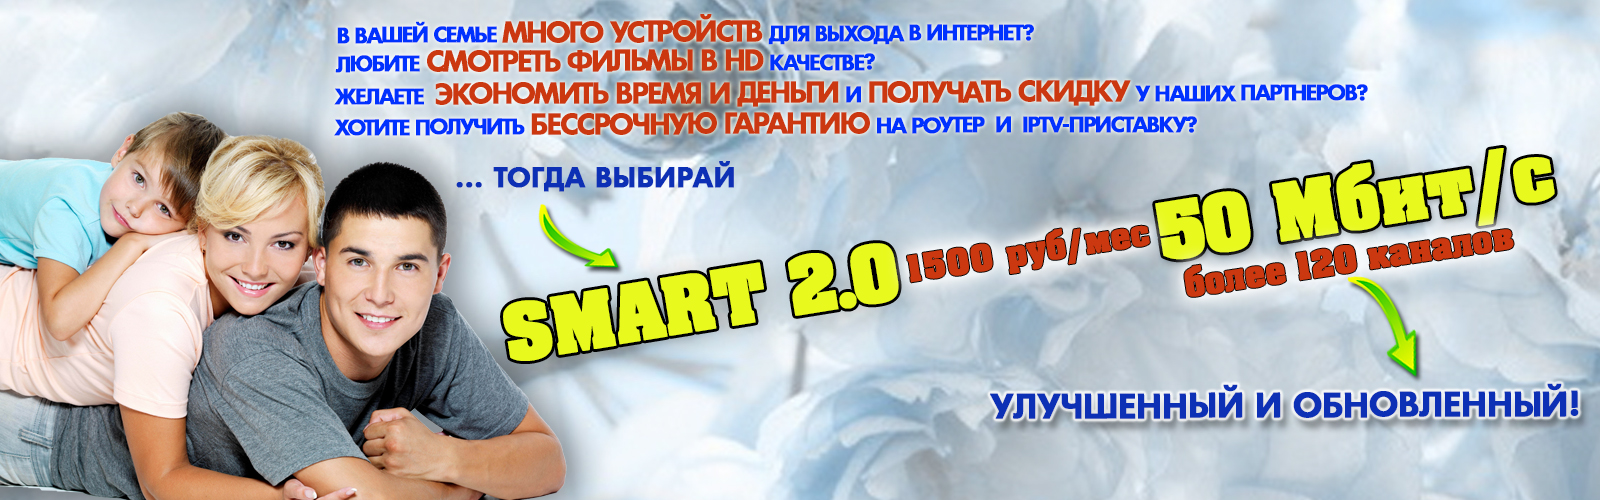 smart20